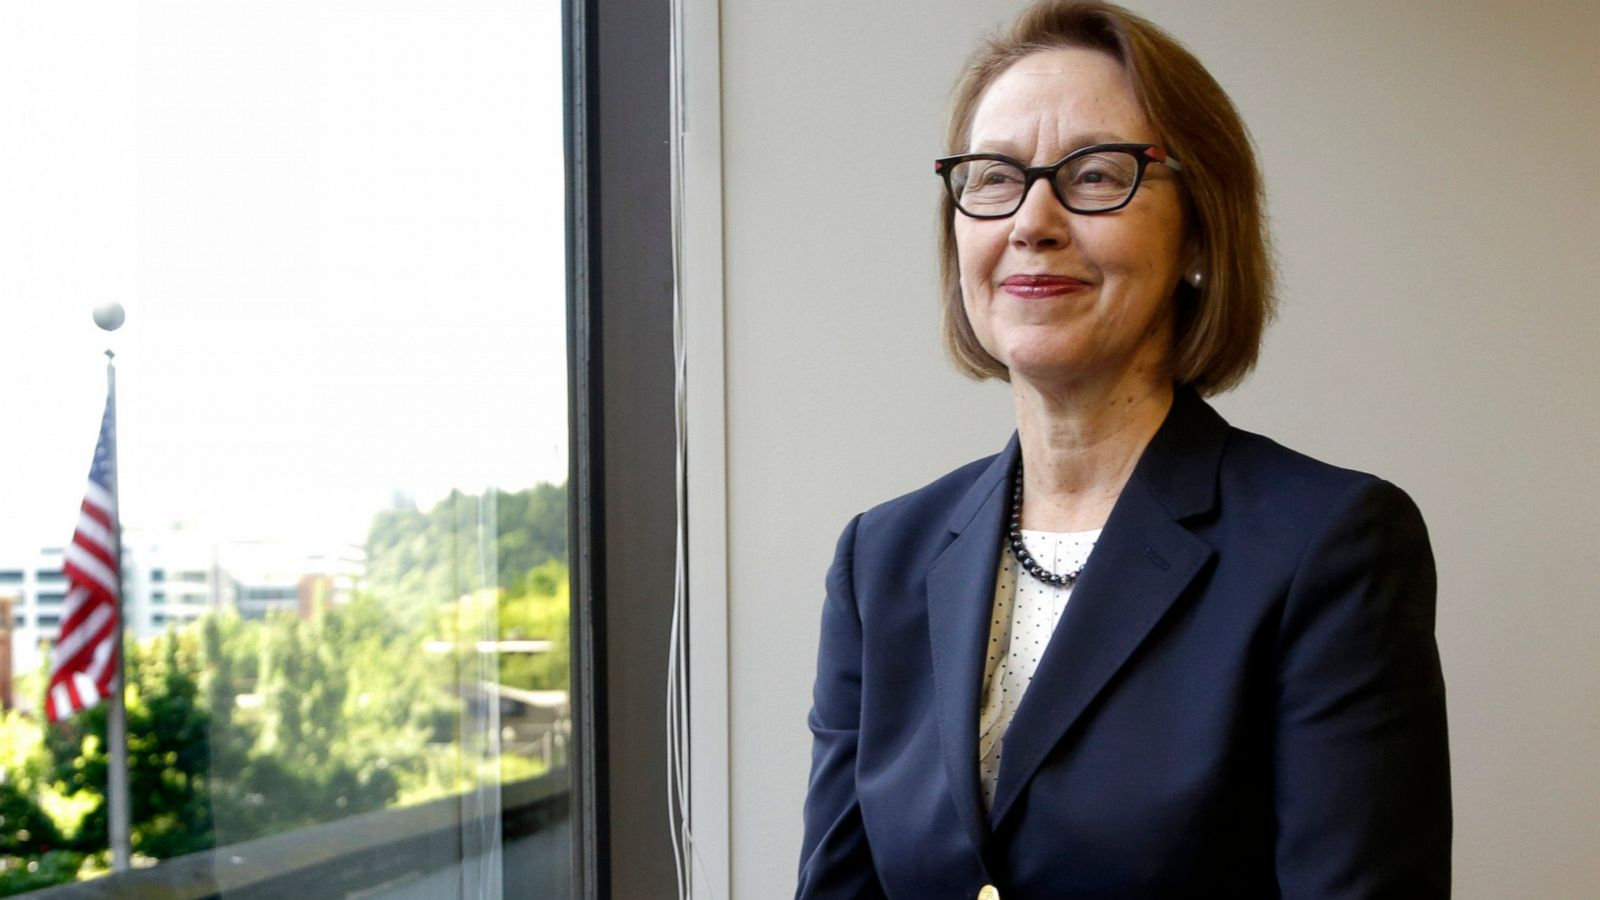 Oregon defends past nonunanimous jury verdicts to high court